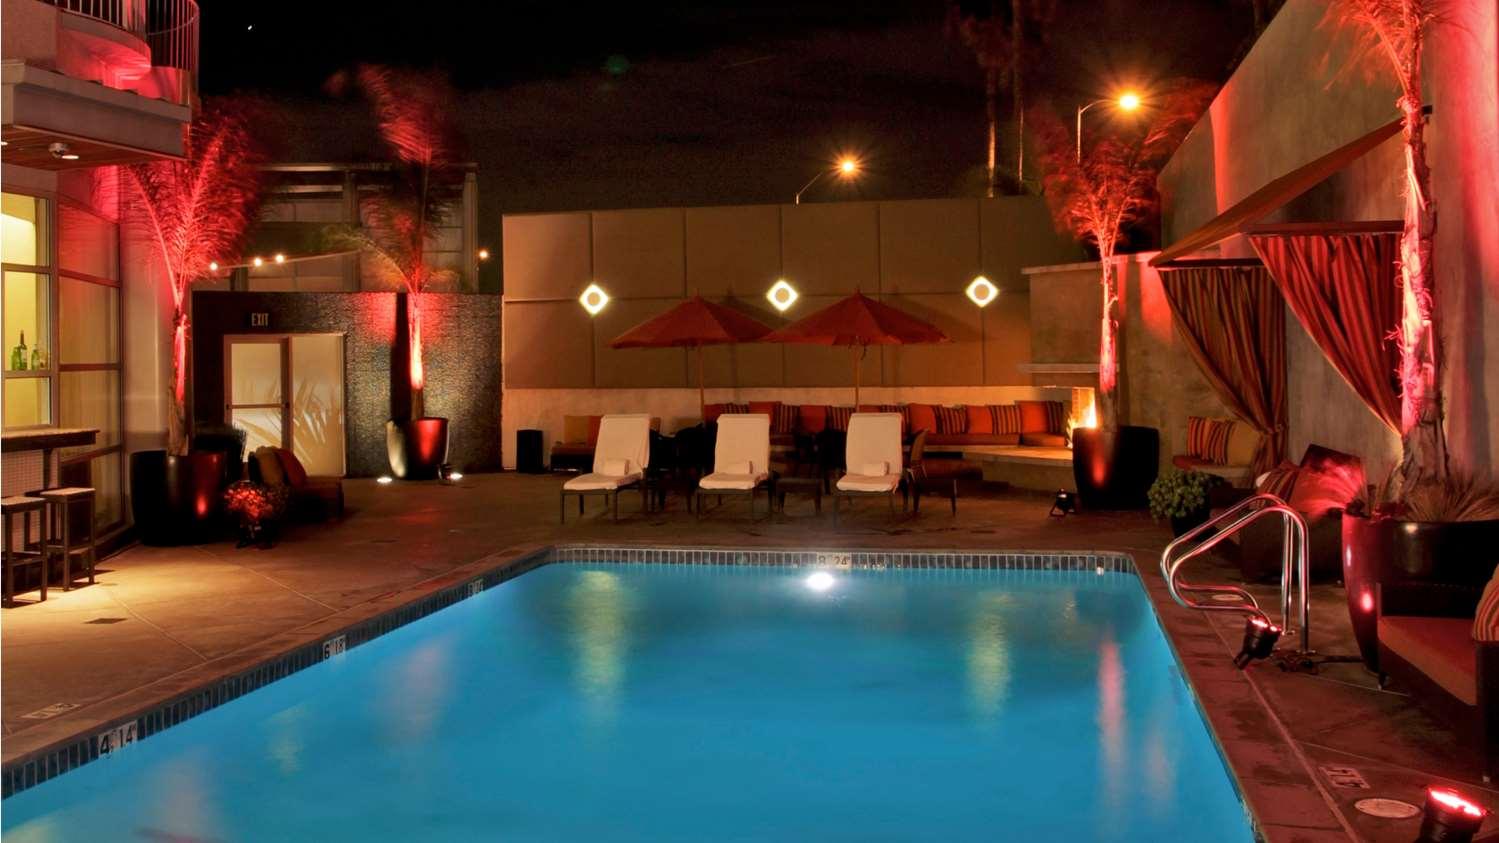 proam - Hotel Angeleno Los Angeles